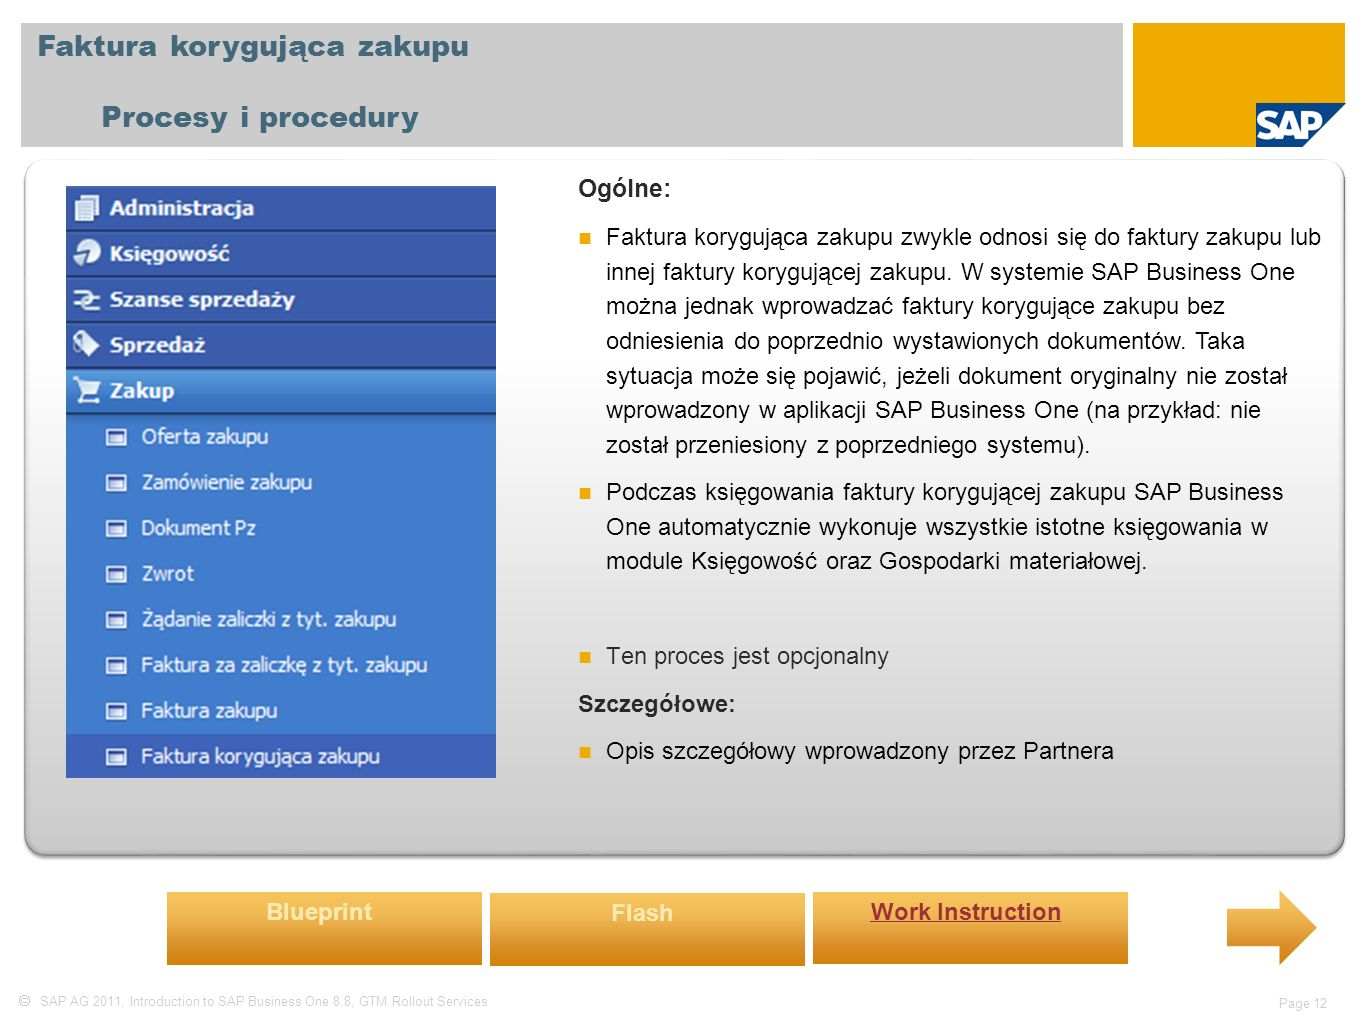  SAP AG 2011, Introduction to SAP Business One 8.8, GTM Rollout Services Page 12 Faktura korygująca zakupu Procesy i procedury Ogólne: Faktura korygu